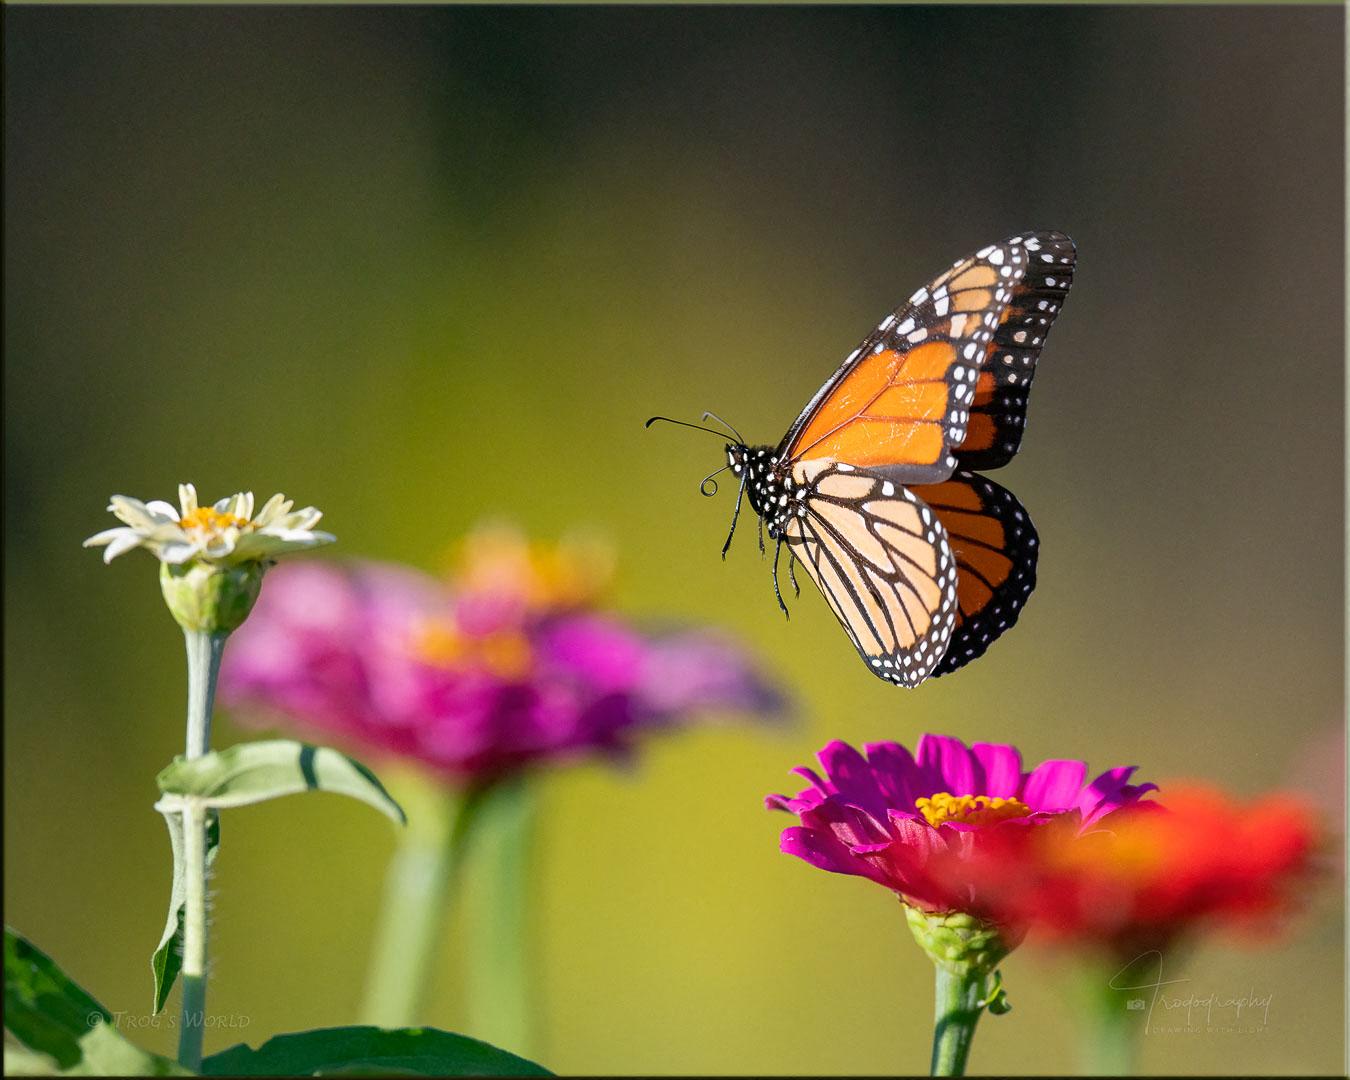 Monarch Butterfly in flight among the flowers